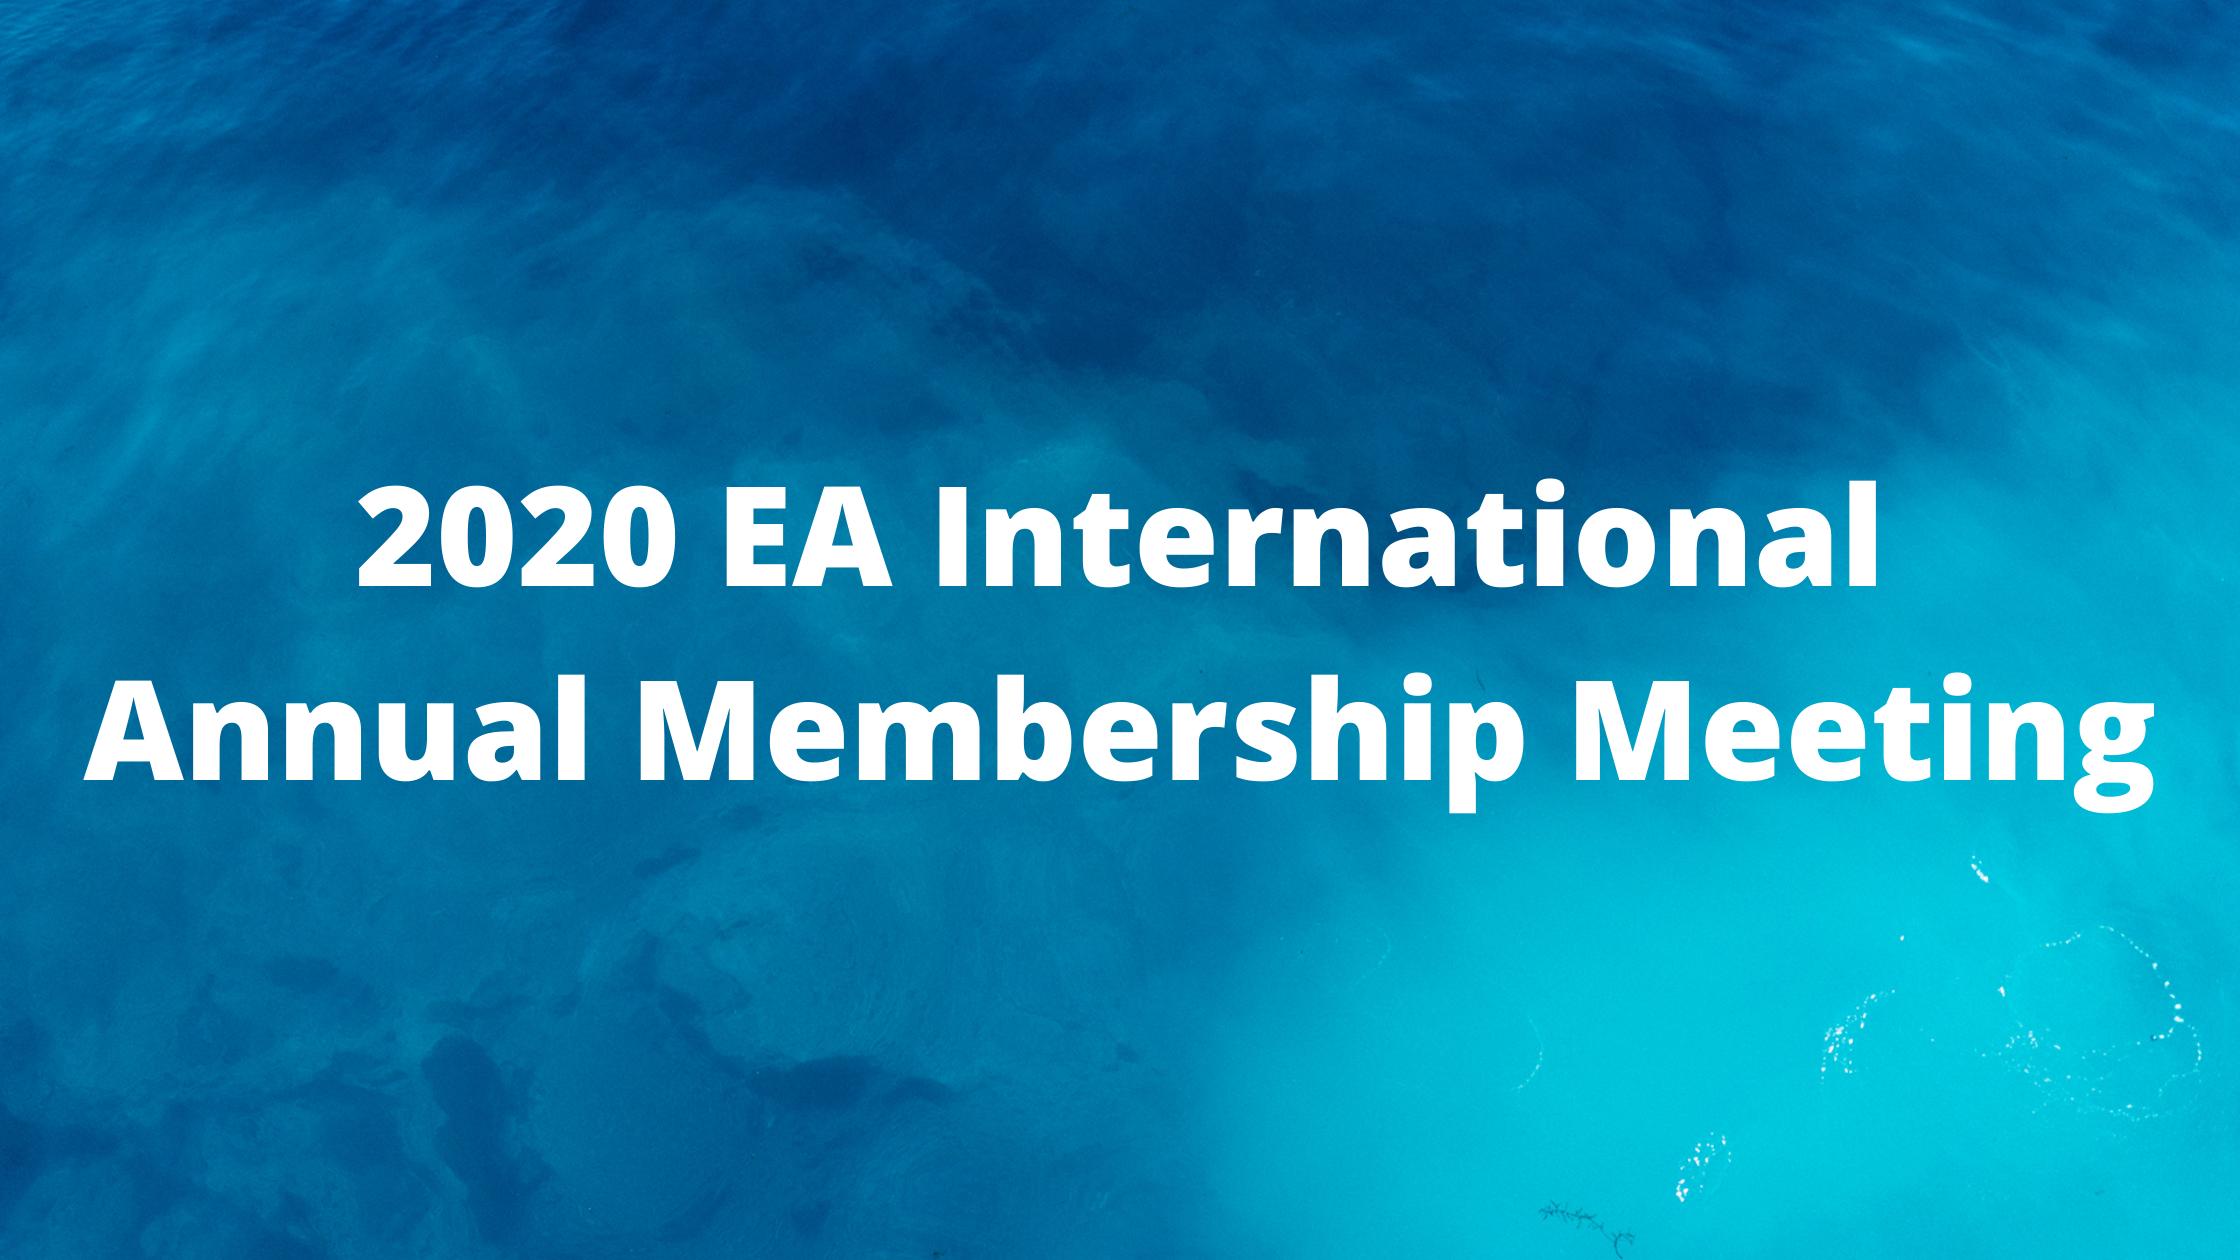 EAI Annual Membership Meeting